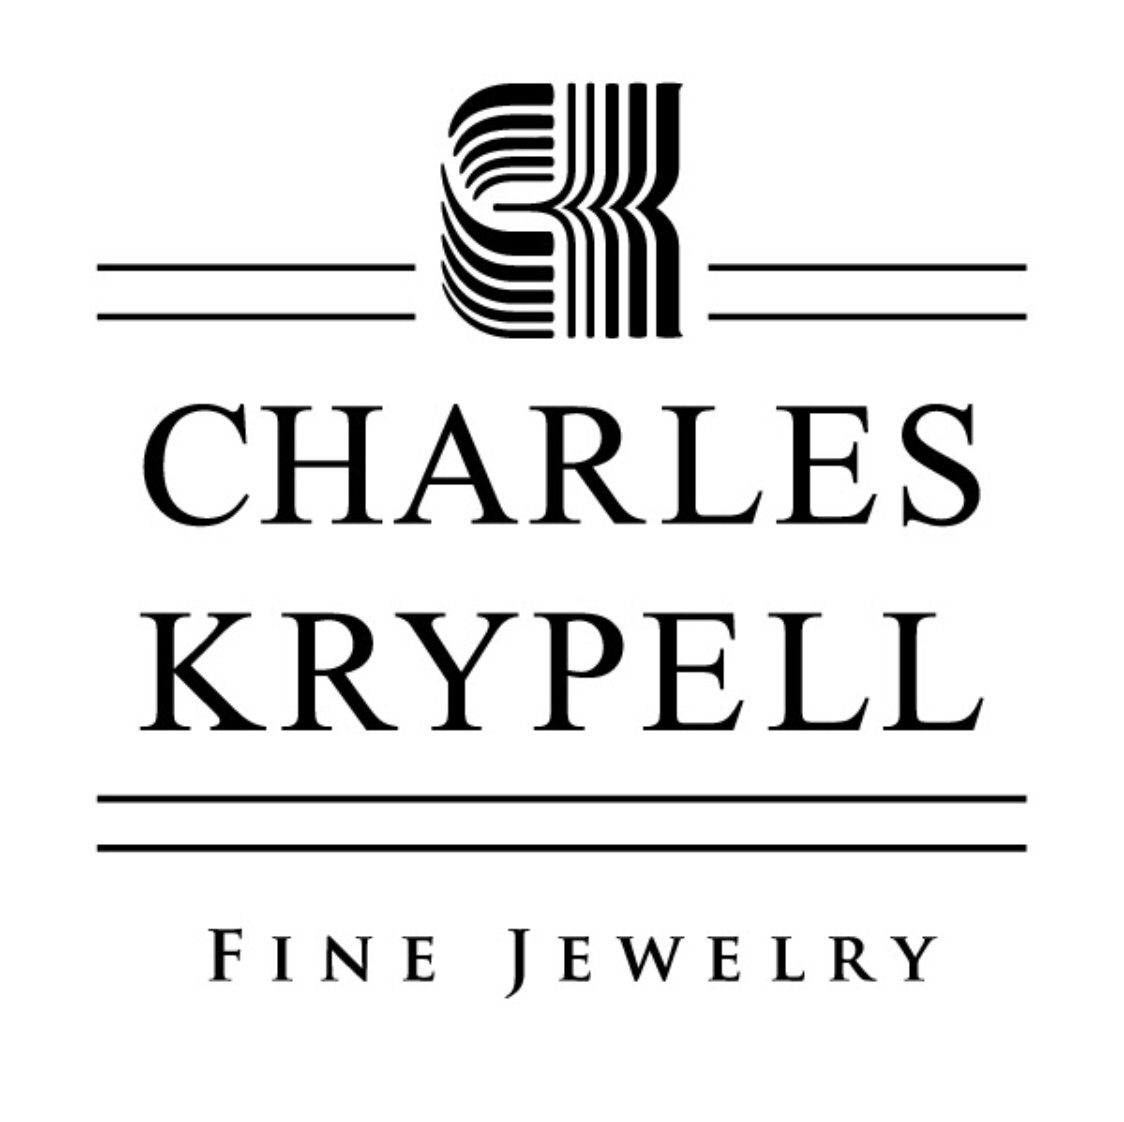 Charles Krypell Fine Jewelry